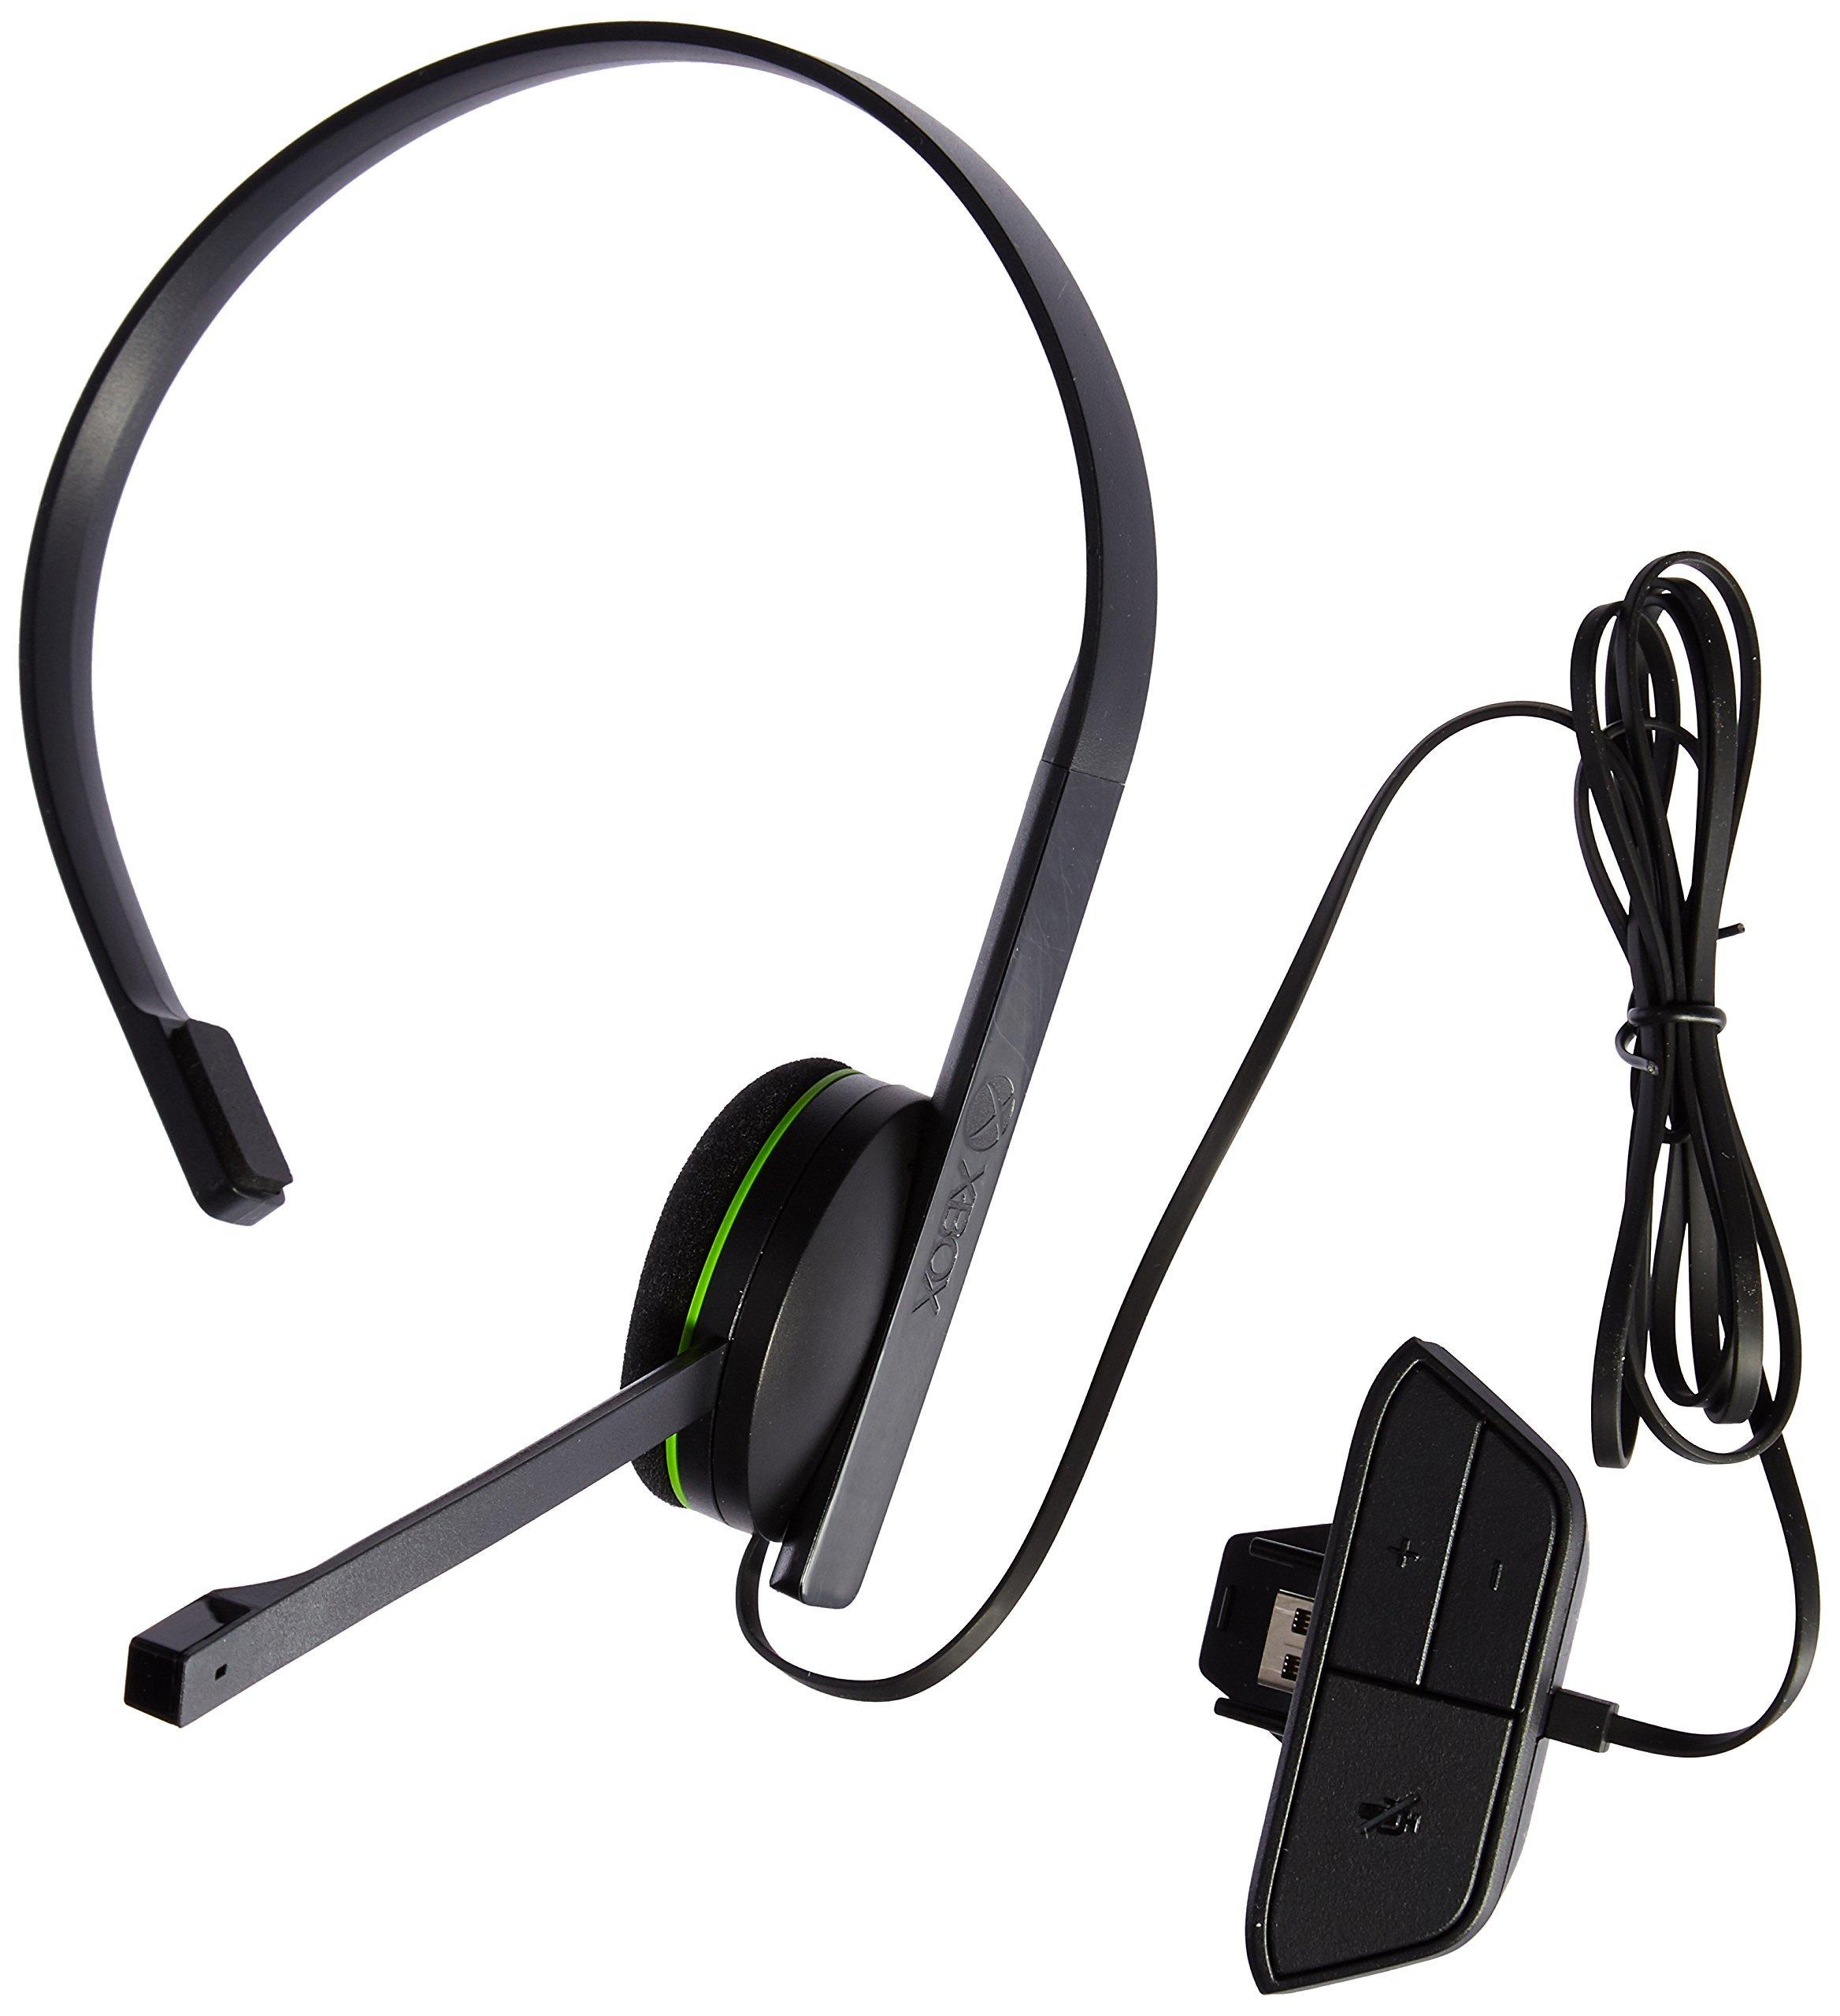 Xbox One Chat Headset (Renewed) by Microsoft